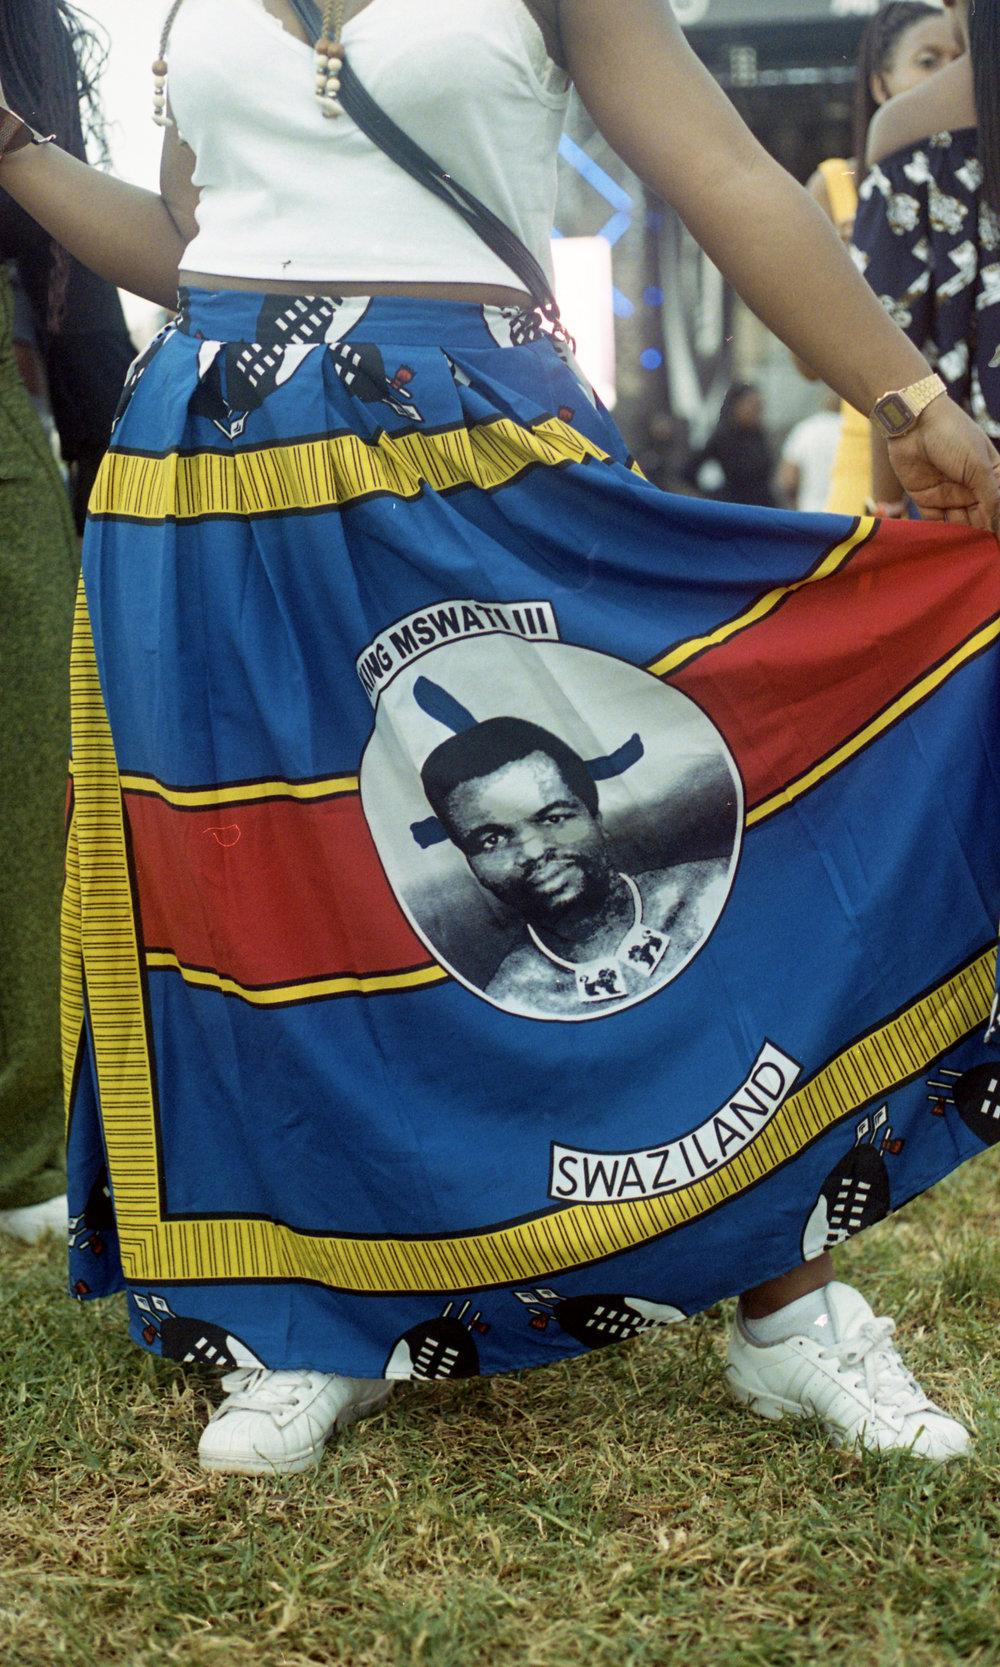 Bongiwe Bongwa, representing Swaziland